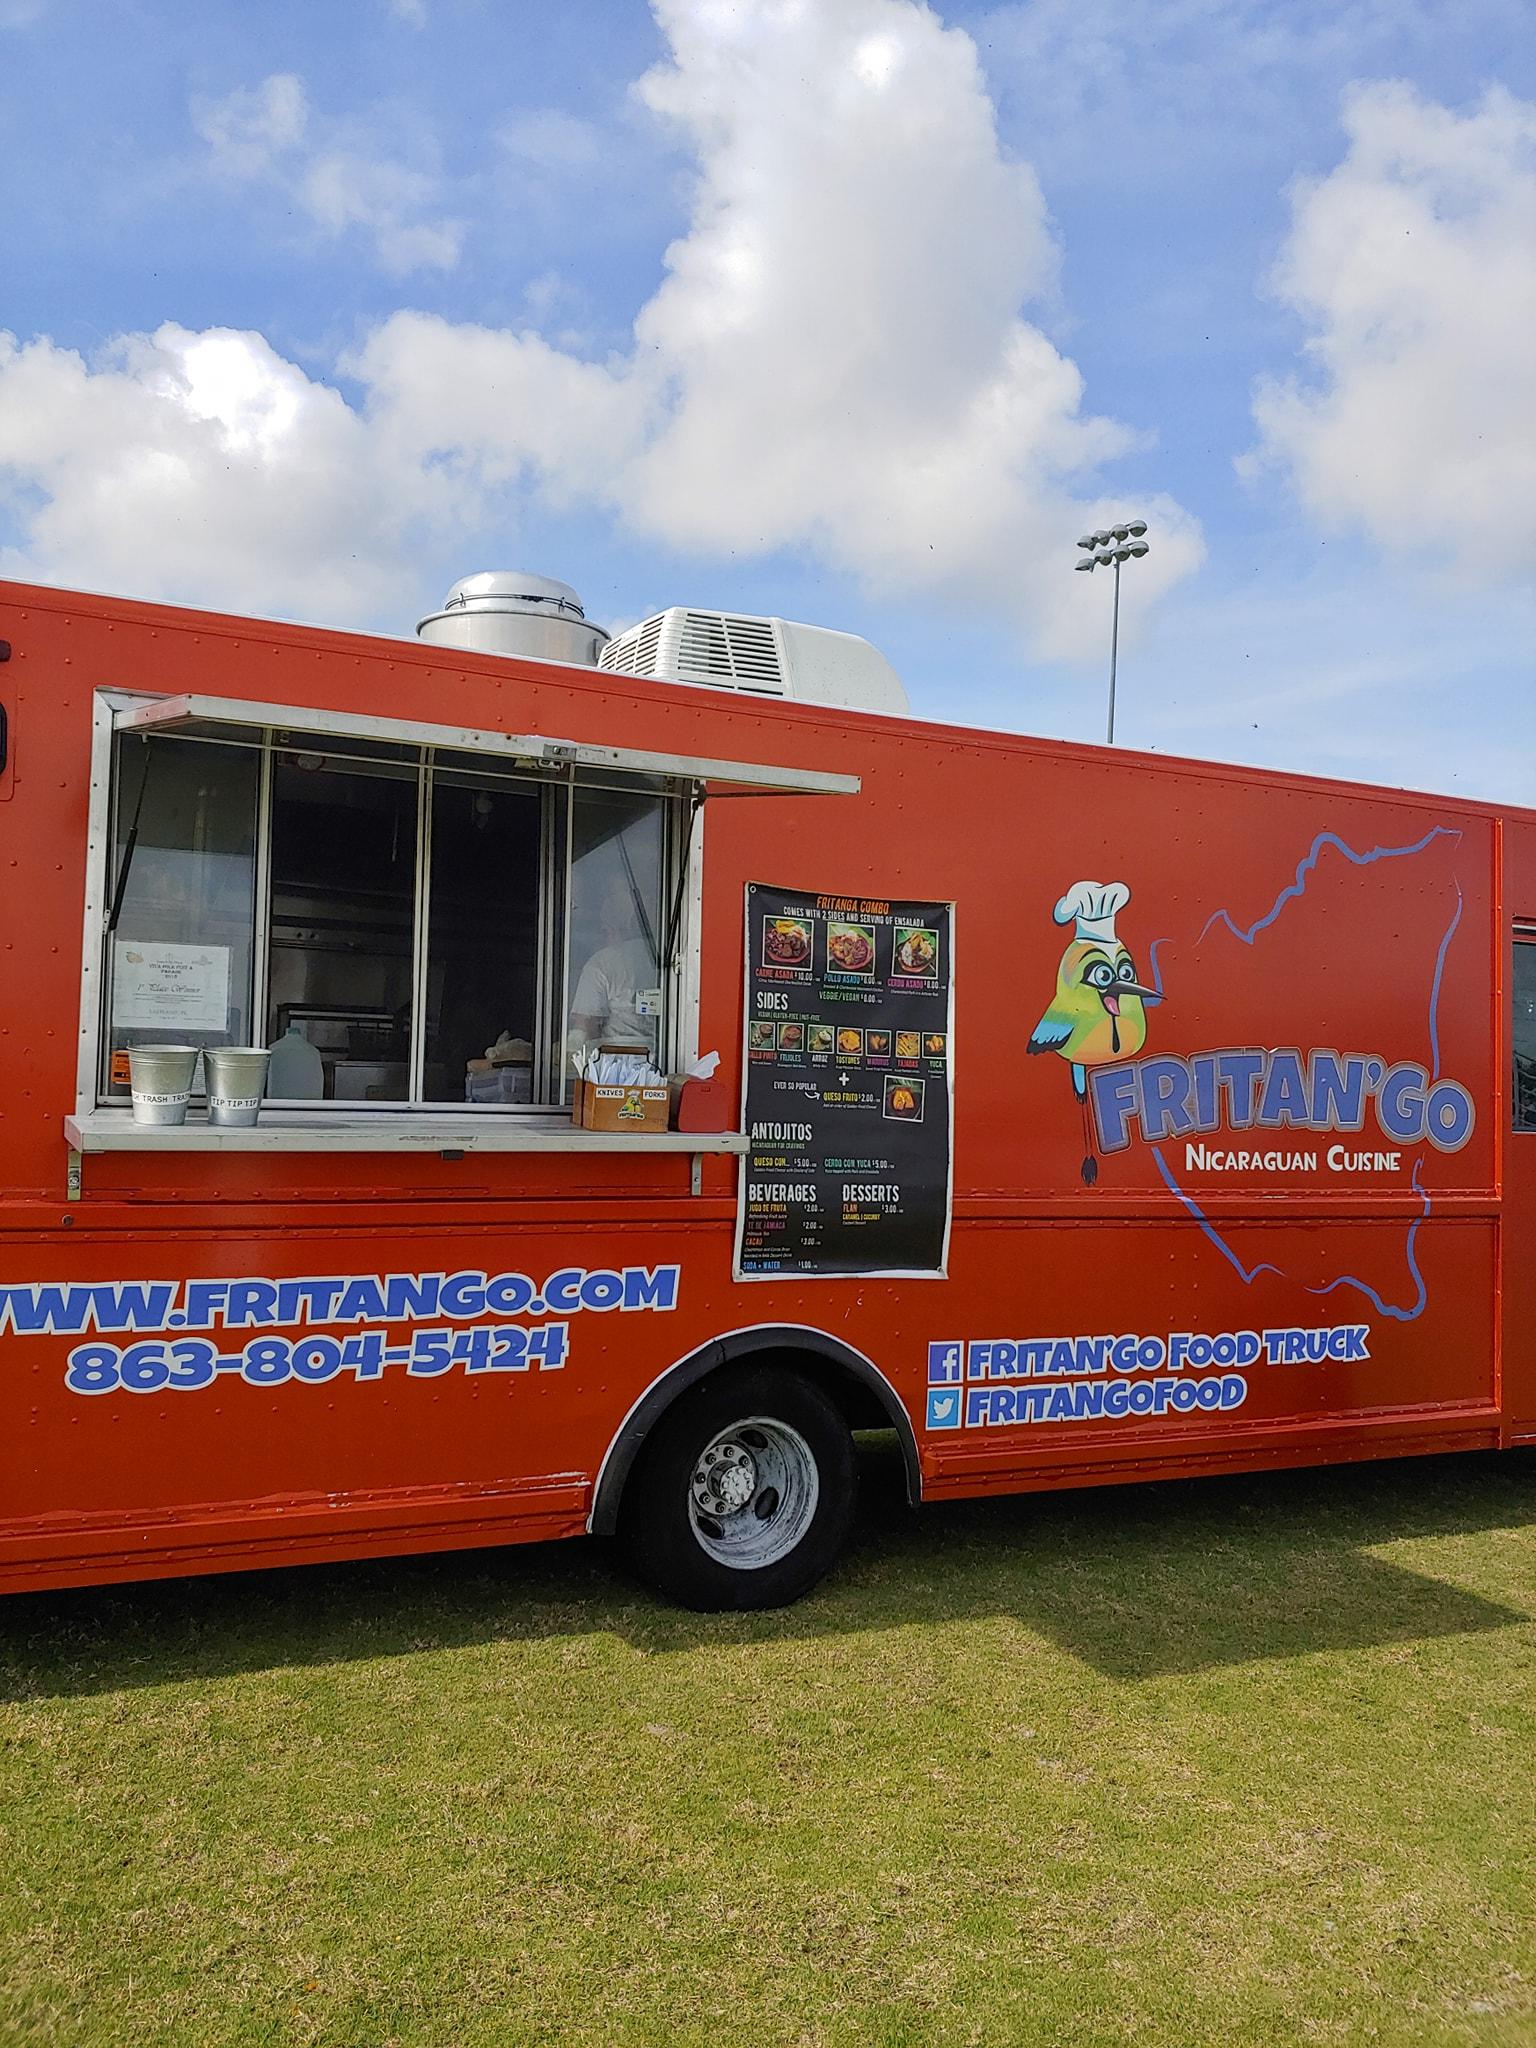 Fritan'Go Food Truck Food Truck